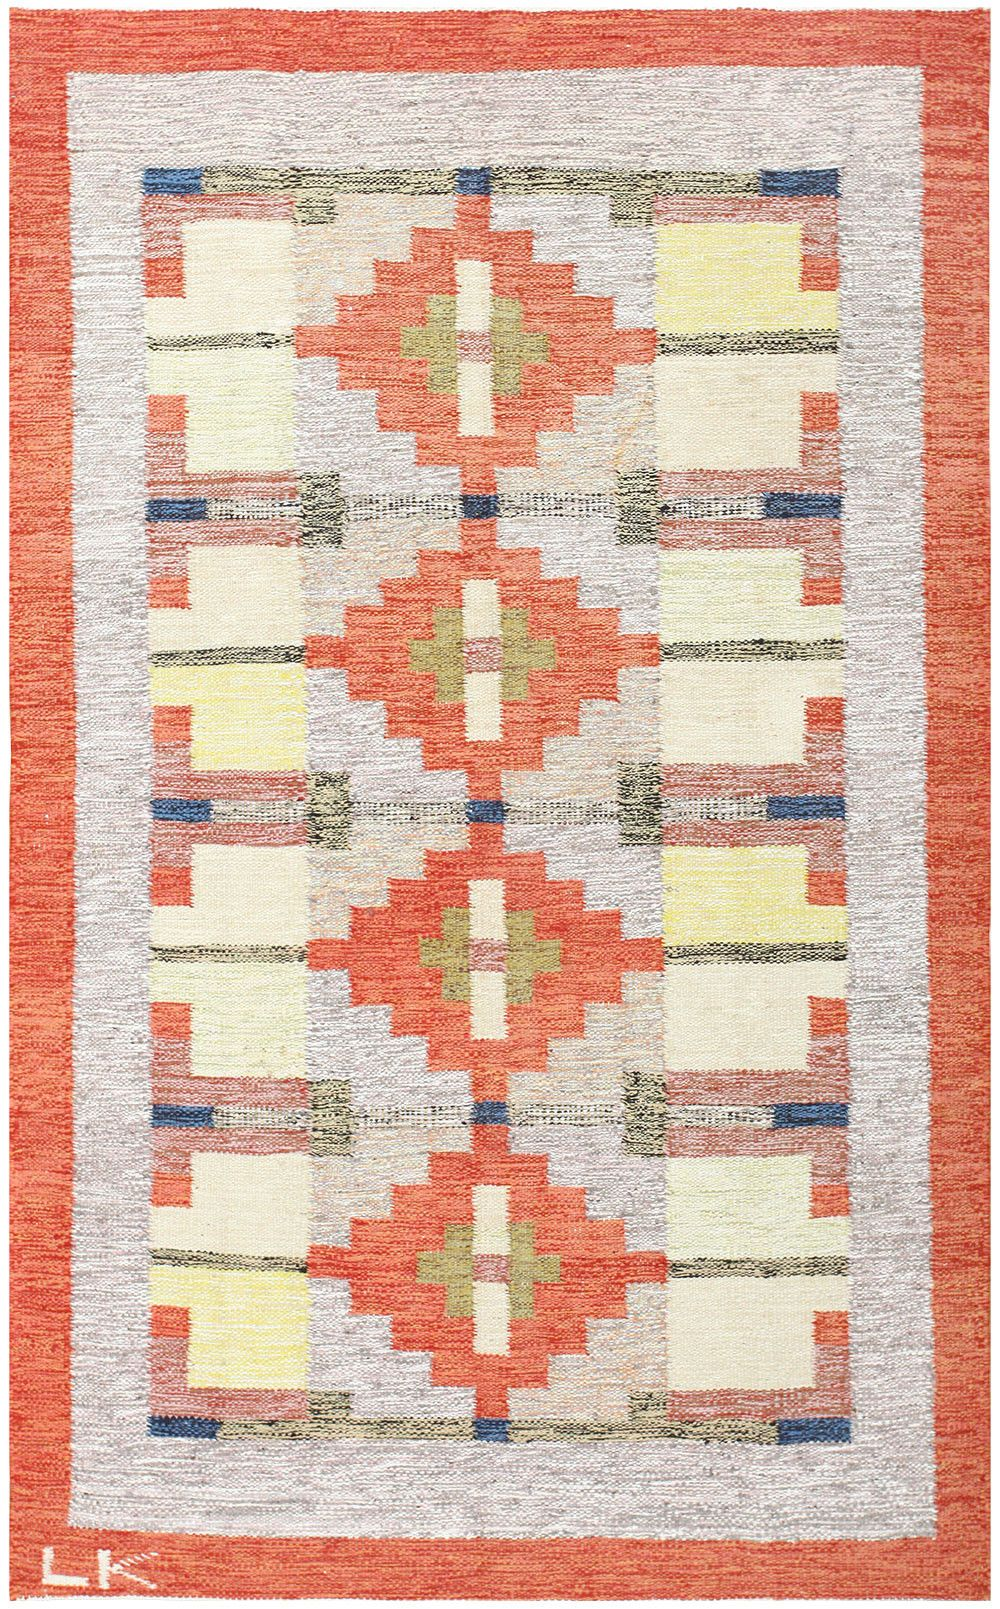 Scandinavian Vintage Swedish Kilim 48498 By Nazmiyal Rugs On Carpet Scandinavian Rug Rugs